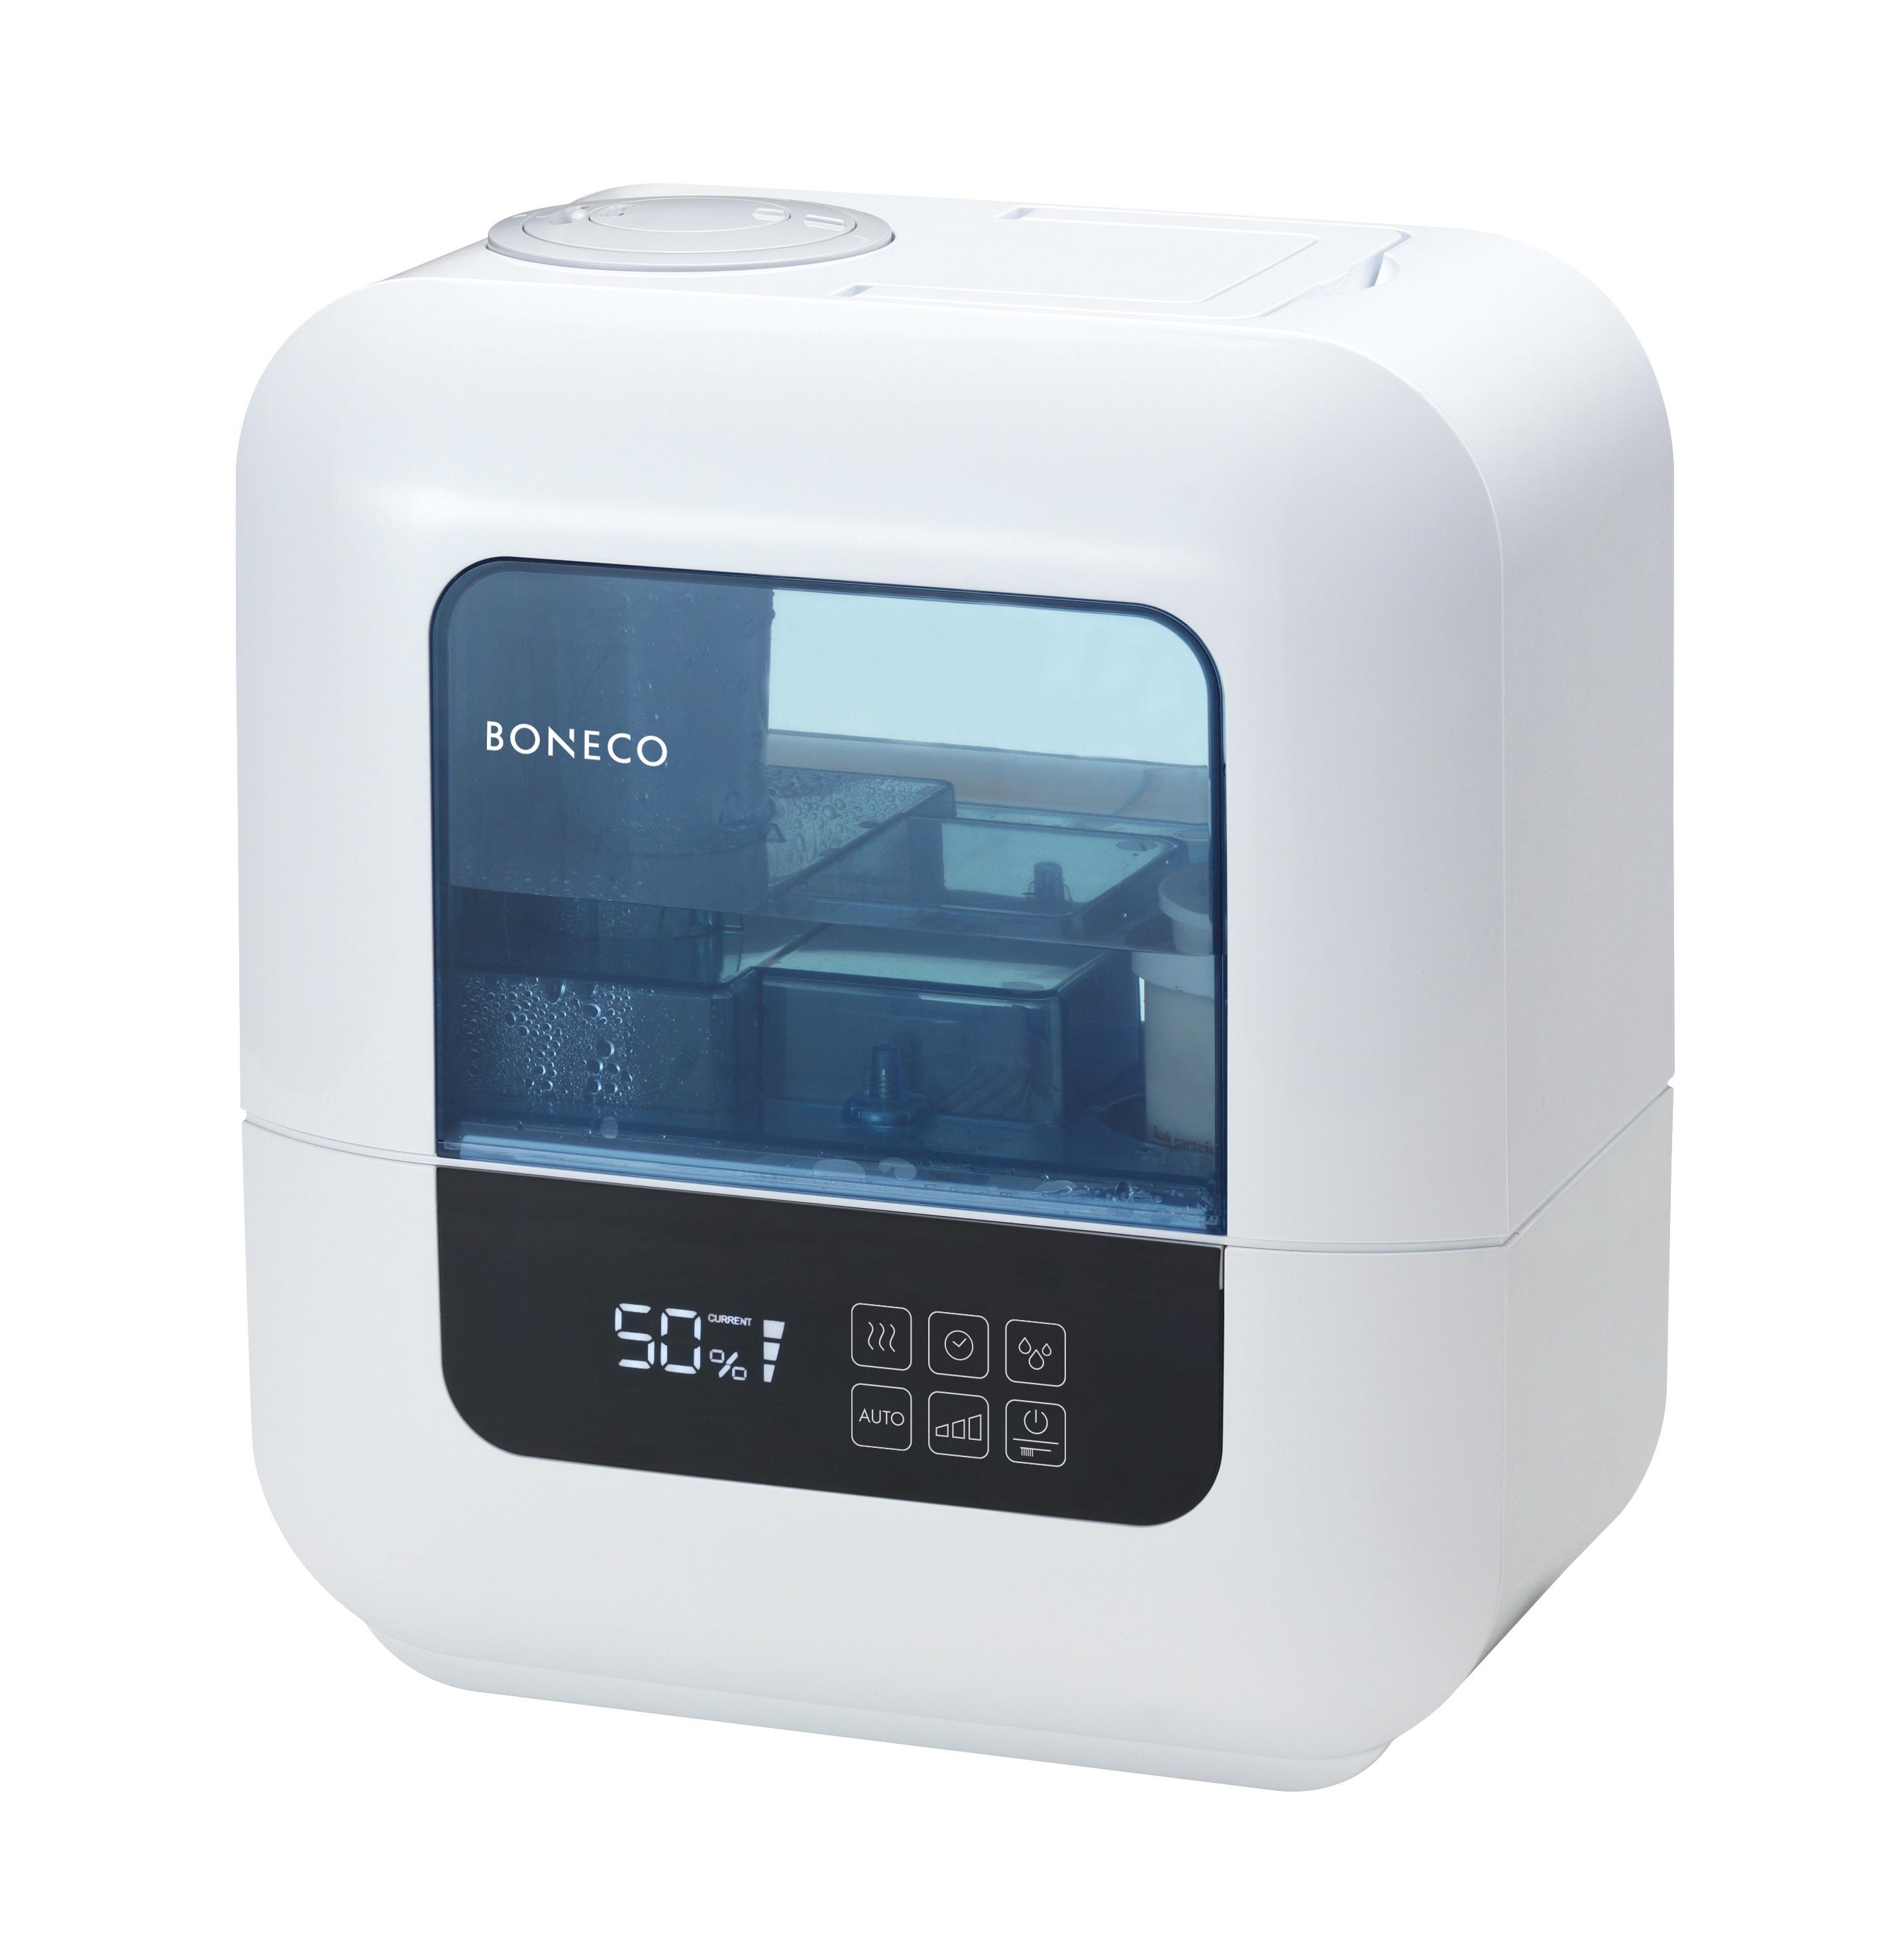 BONECO U700 Ultrasone